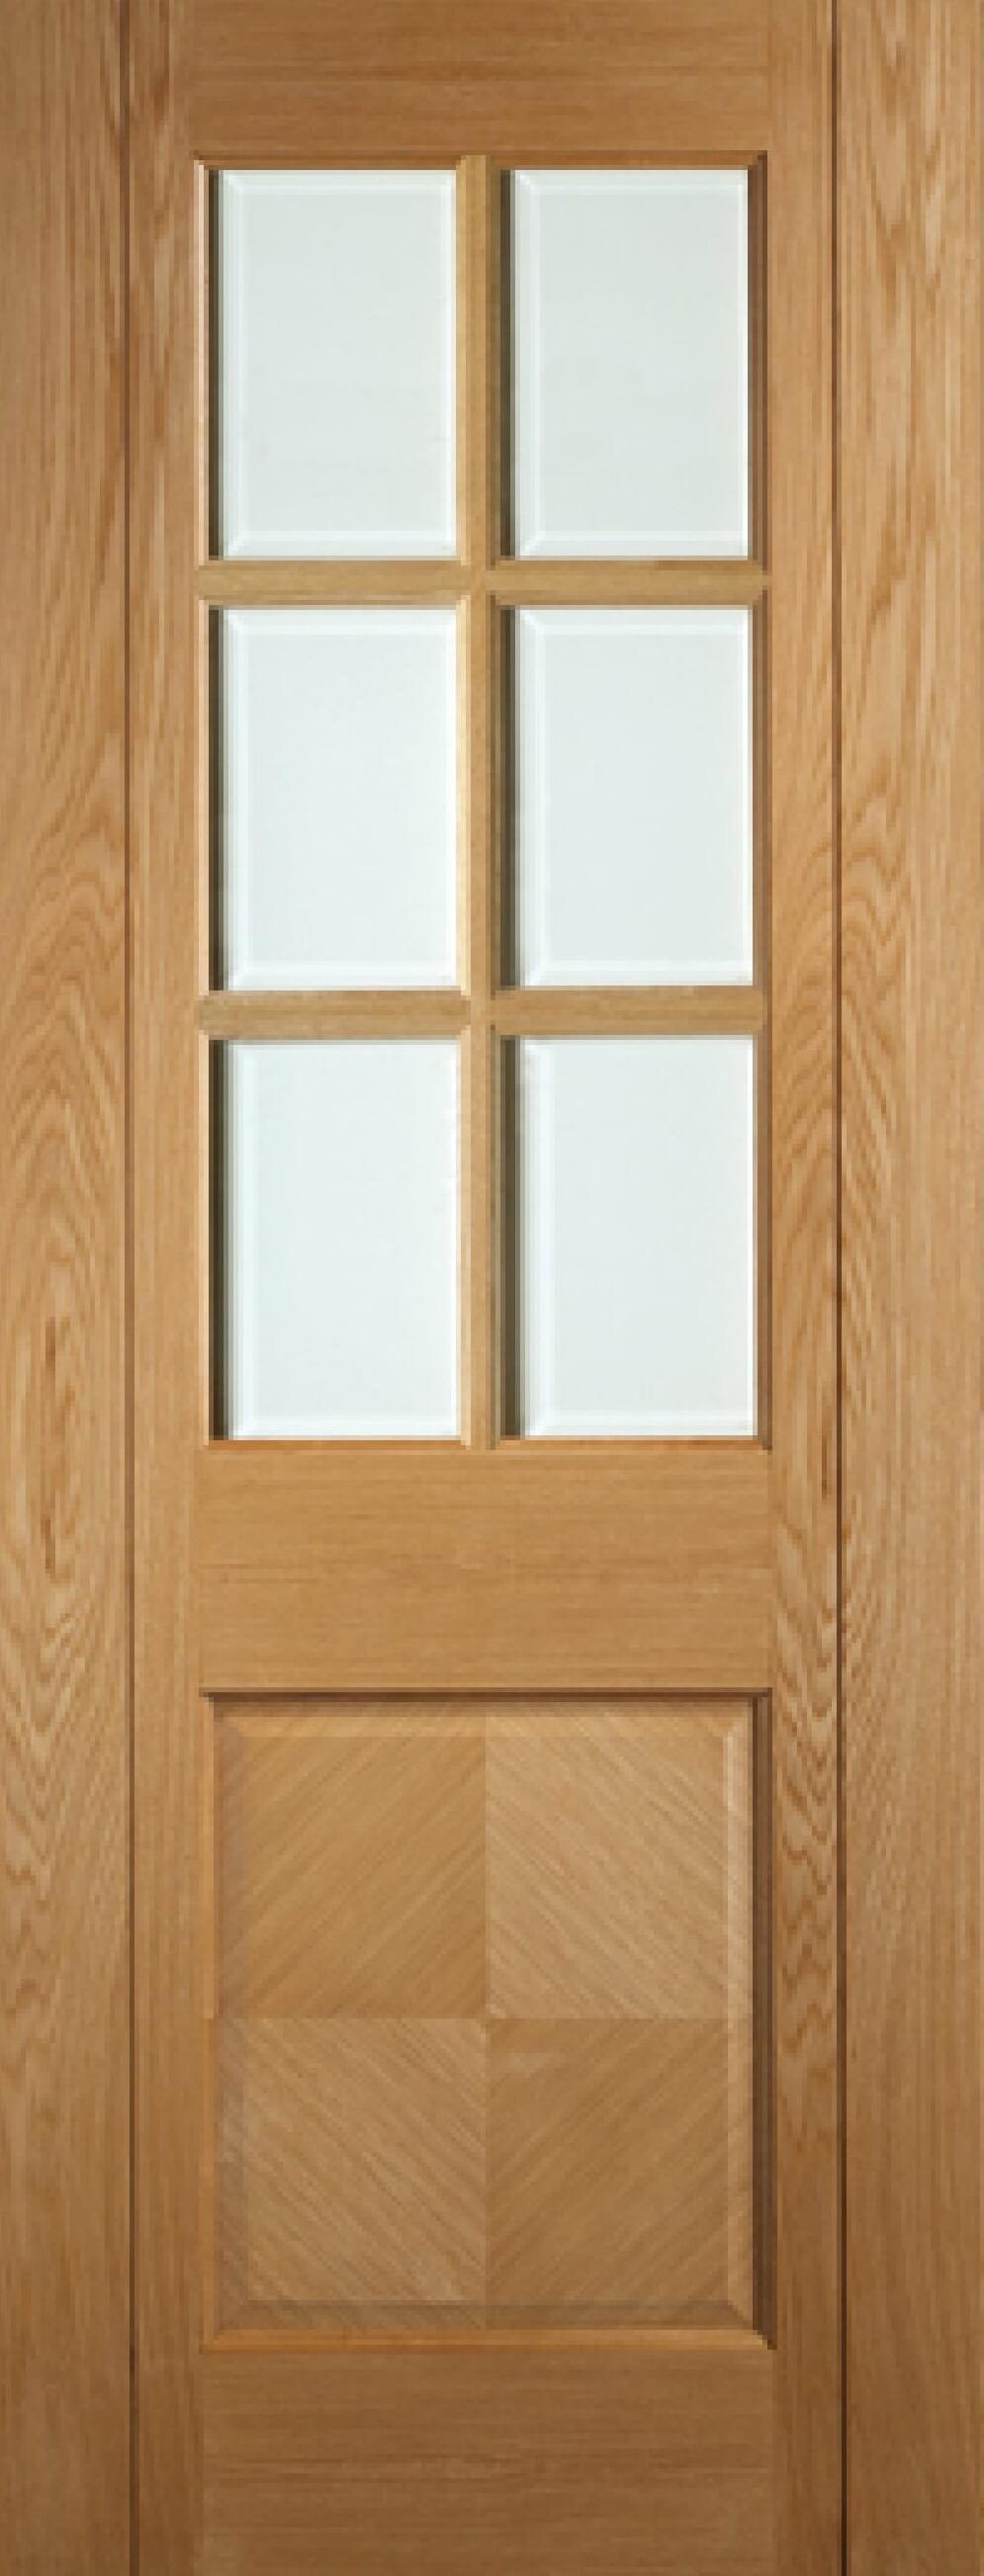 Kensington Glazed Oak Prefinished Image